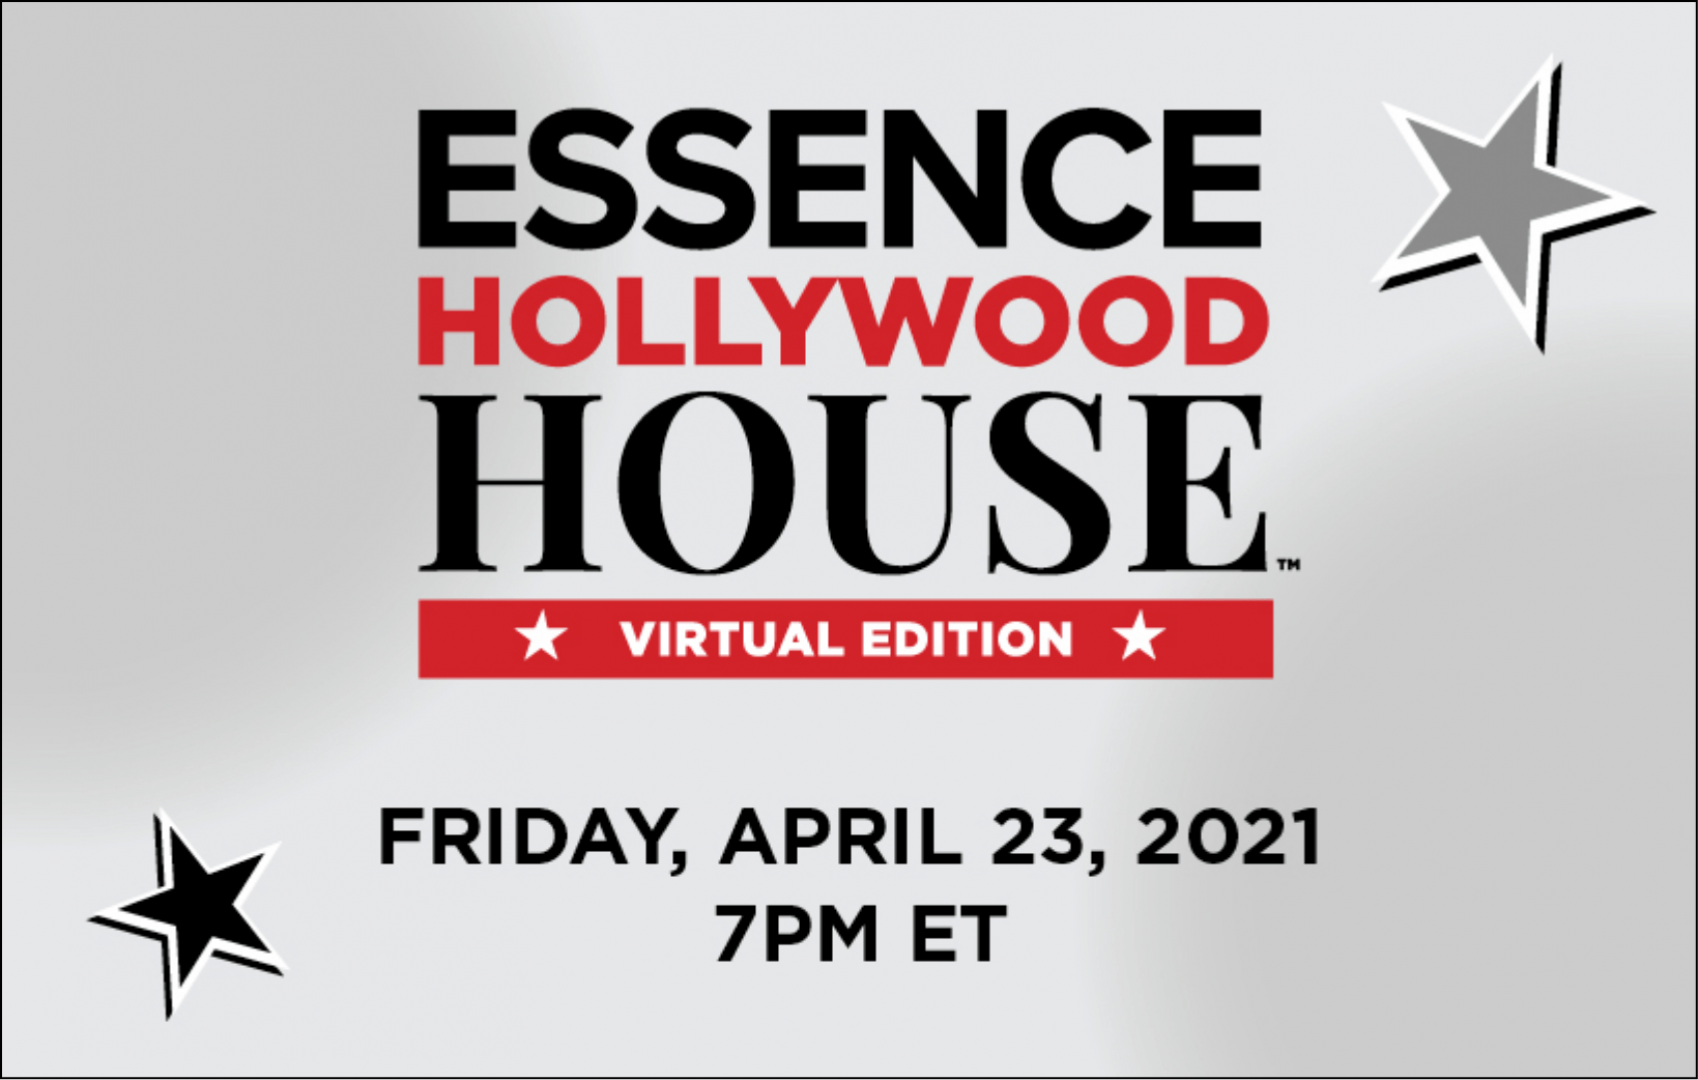 Essence Hollywood House